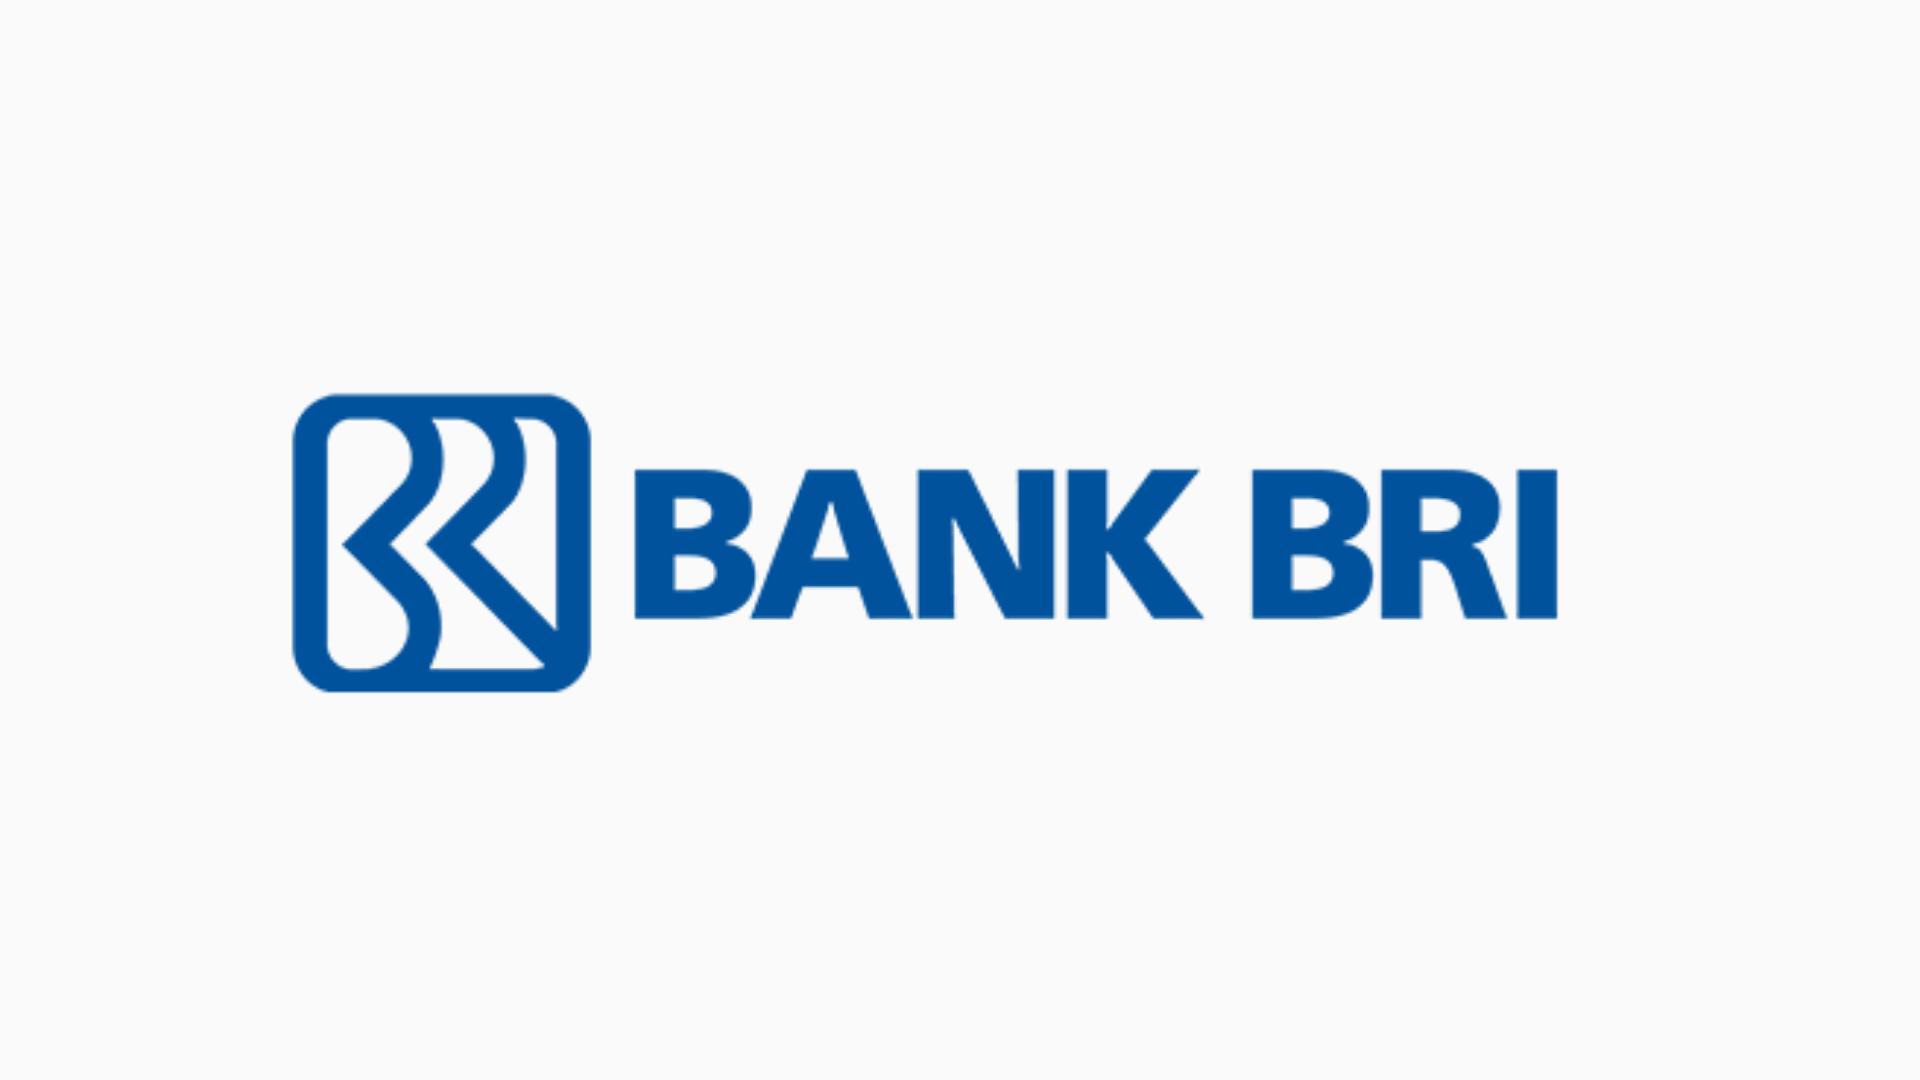 Jam Buka Bank Bri Lampung Barat